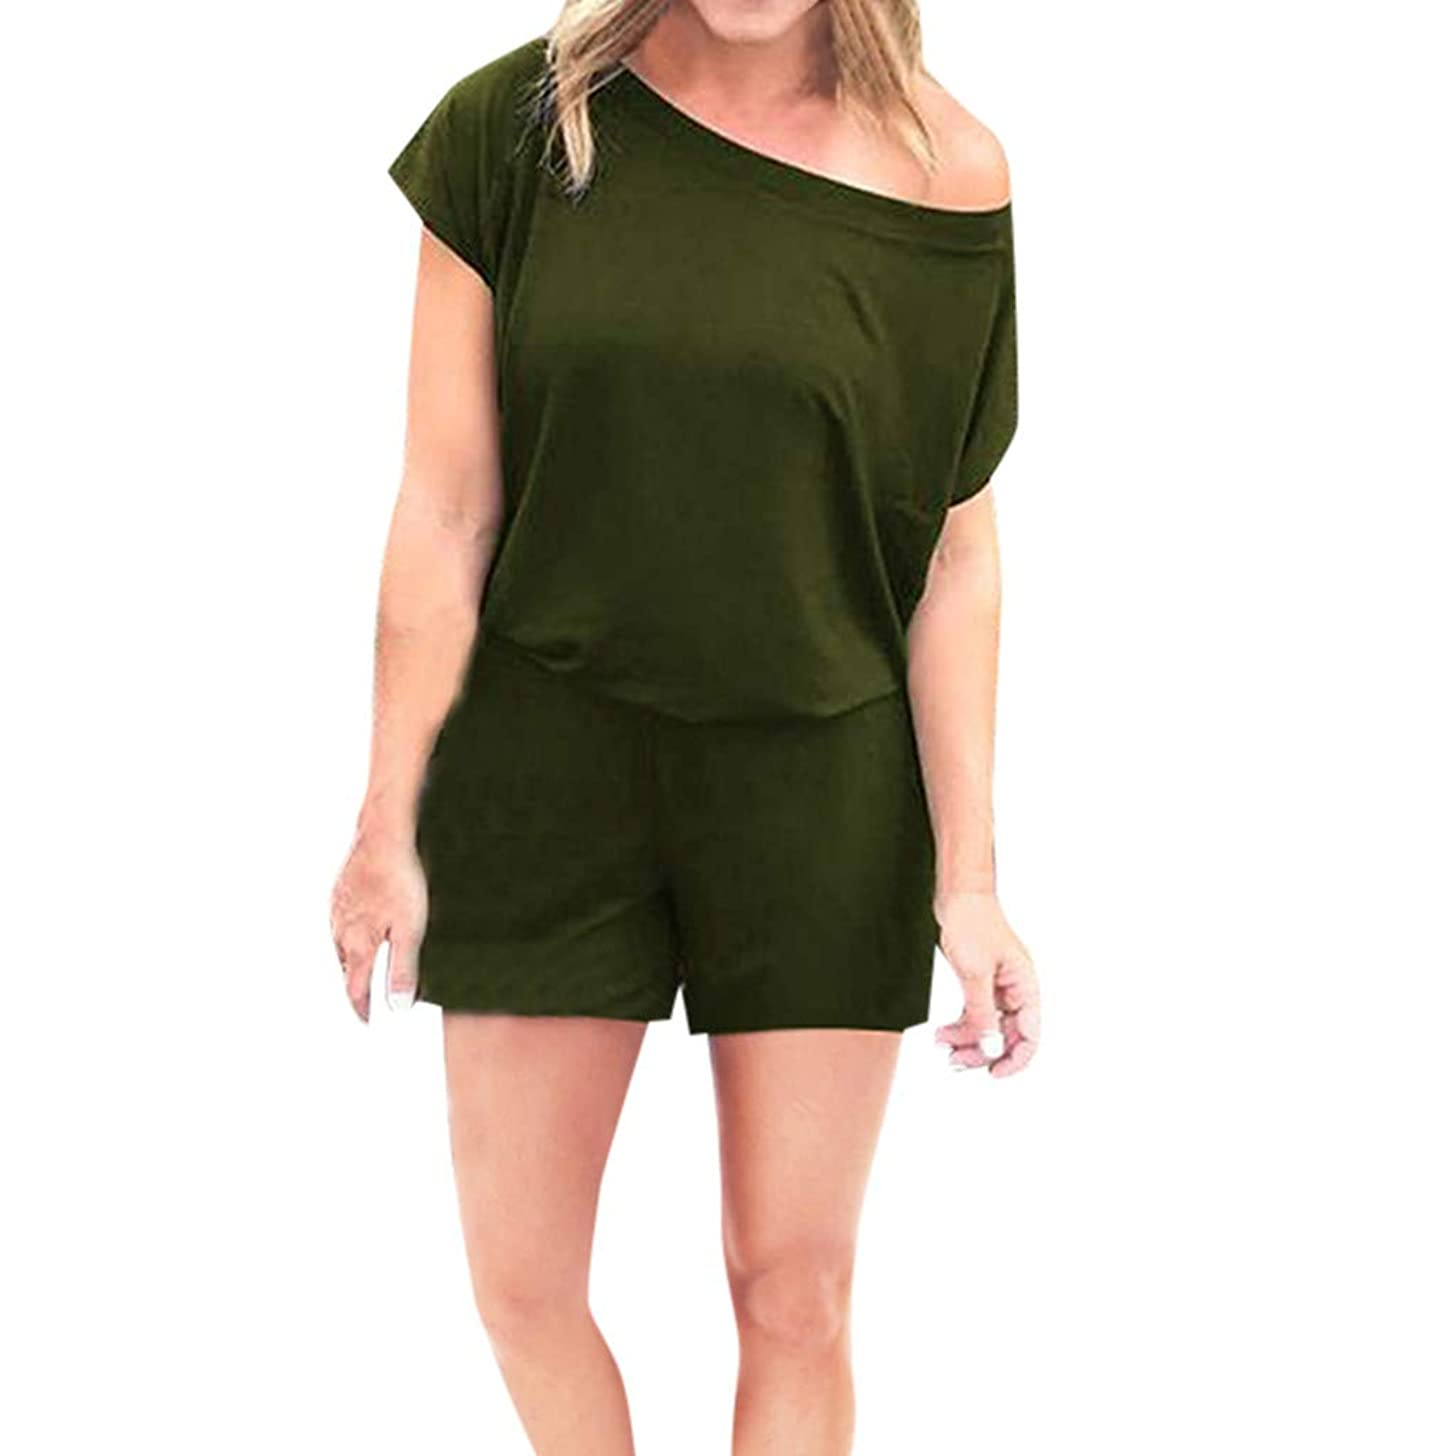 Selomore Women's Loose Solid Off Shoulder Elastic Waist Stretchy Short Romper Jumpsuit